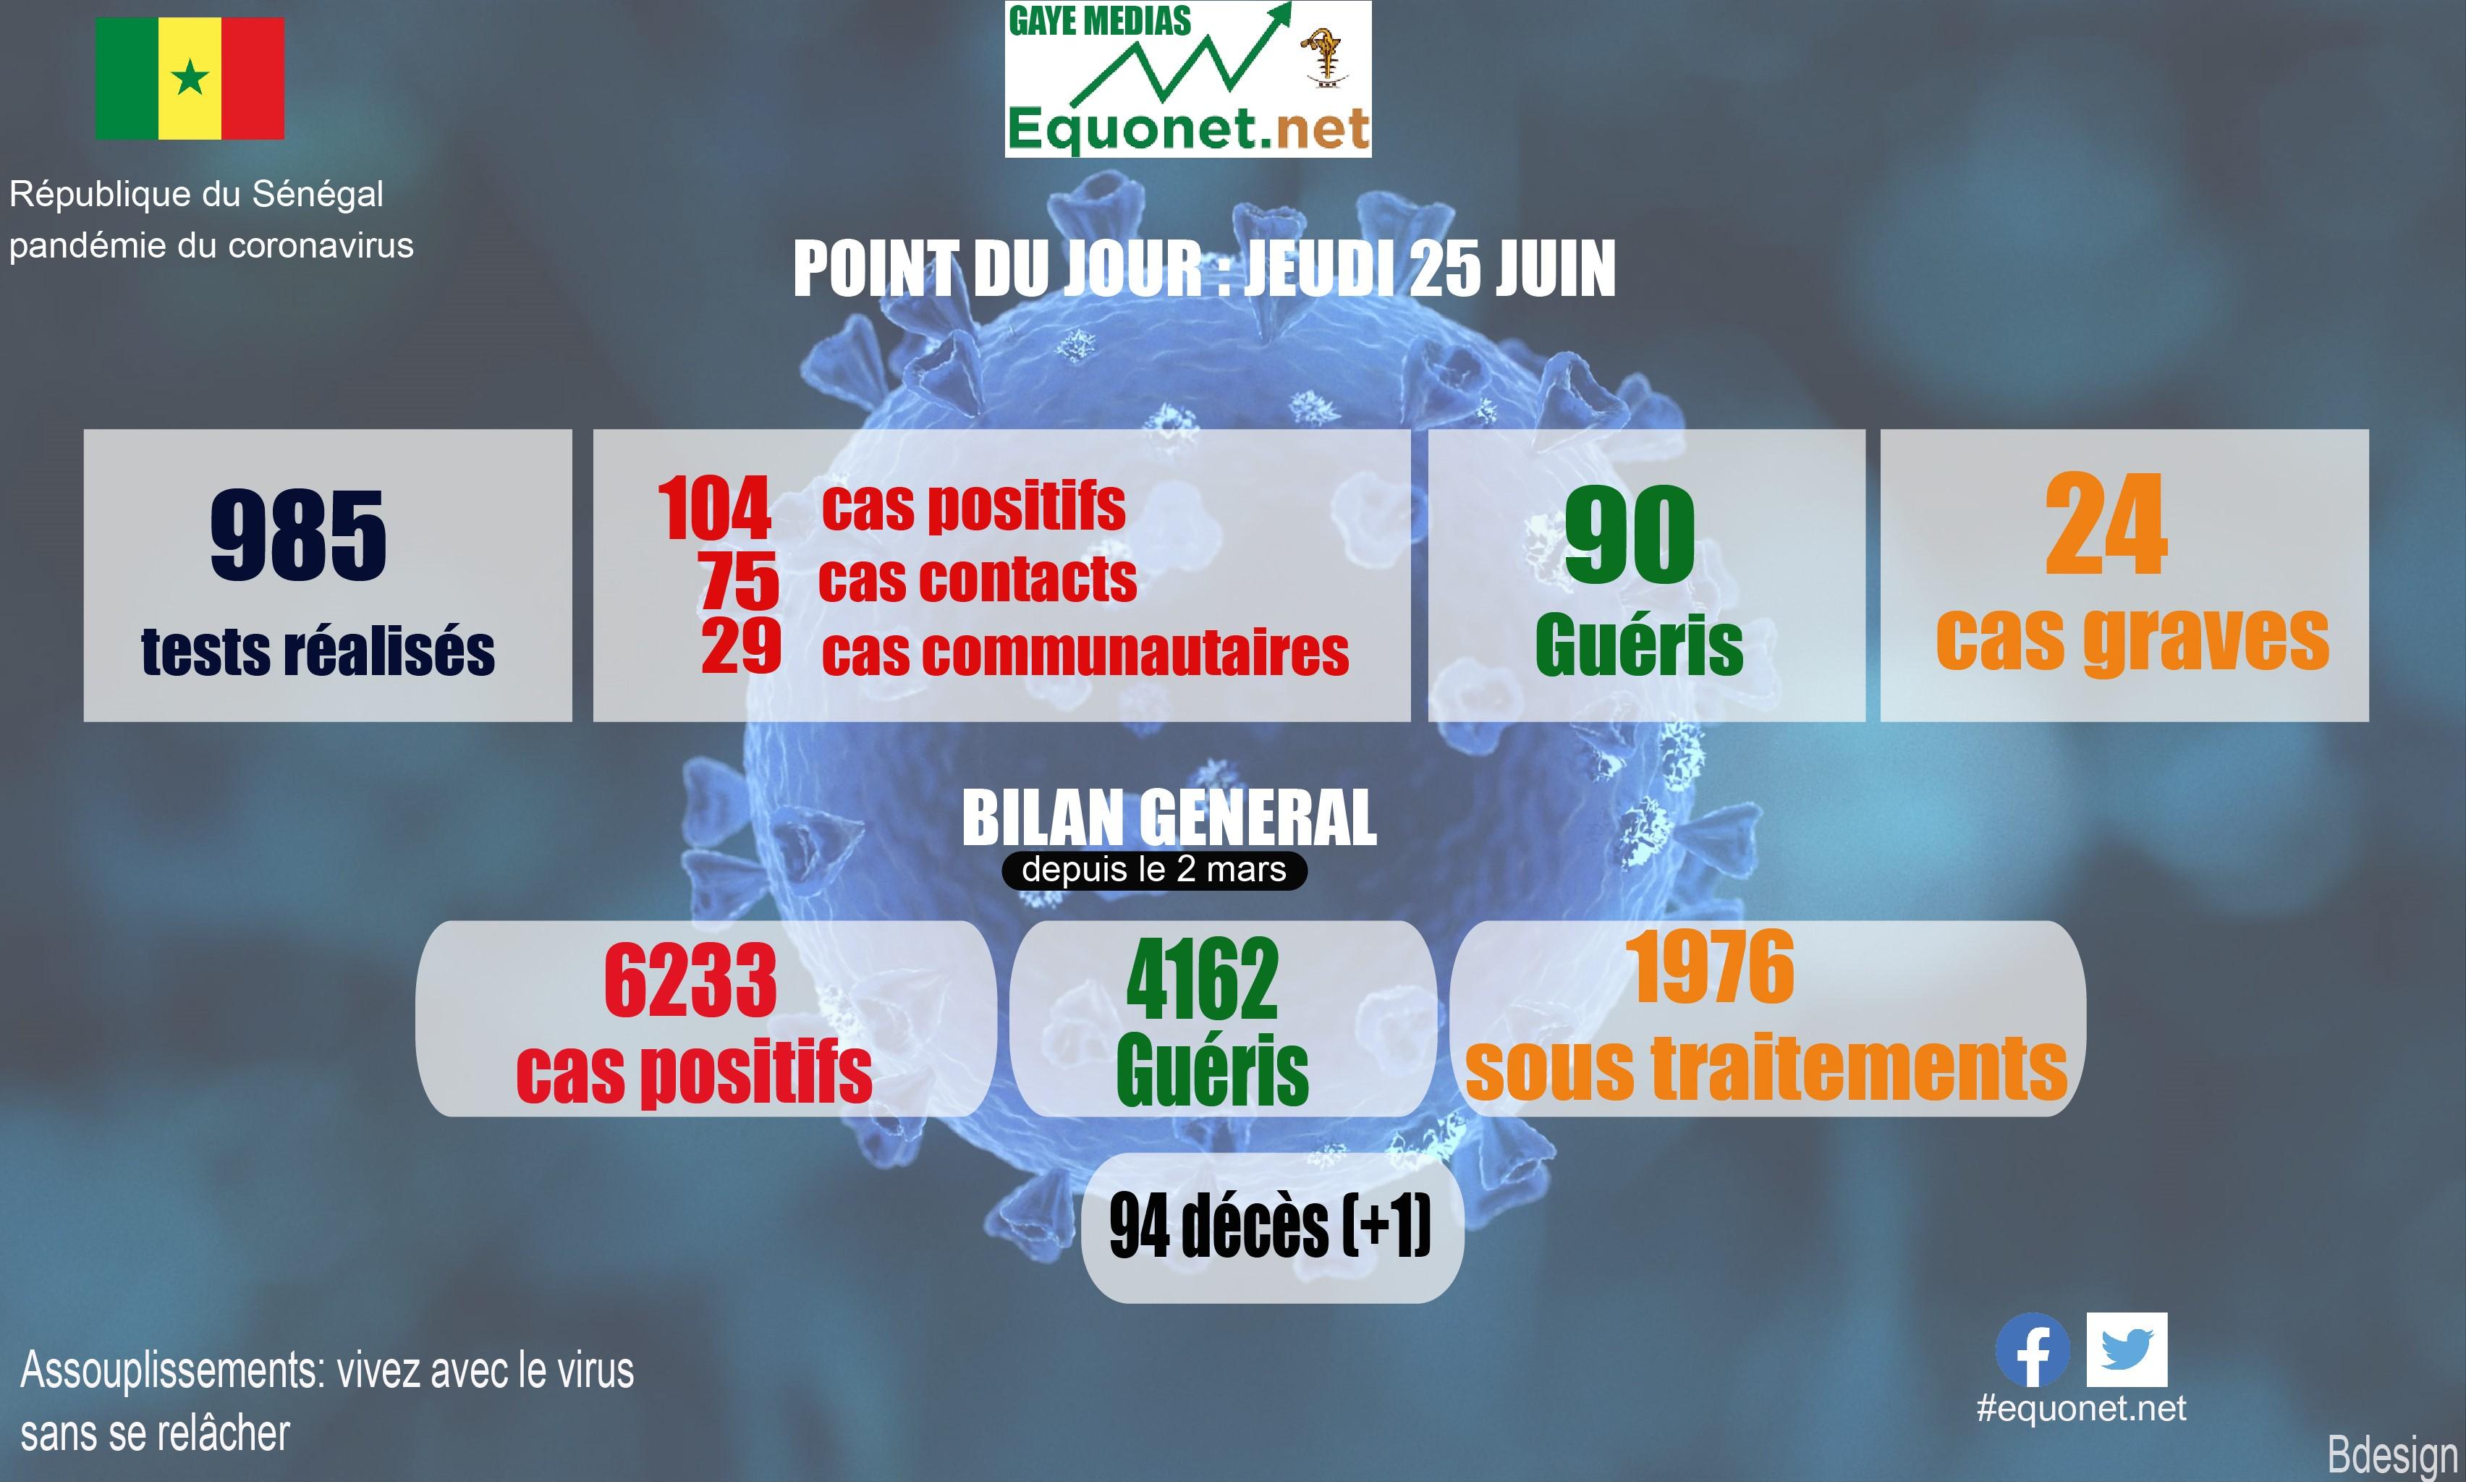 pandémie du coronavirus-covid-19 au sénégal : point de situation du jeudi 25 juin 2020